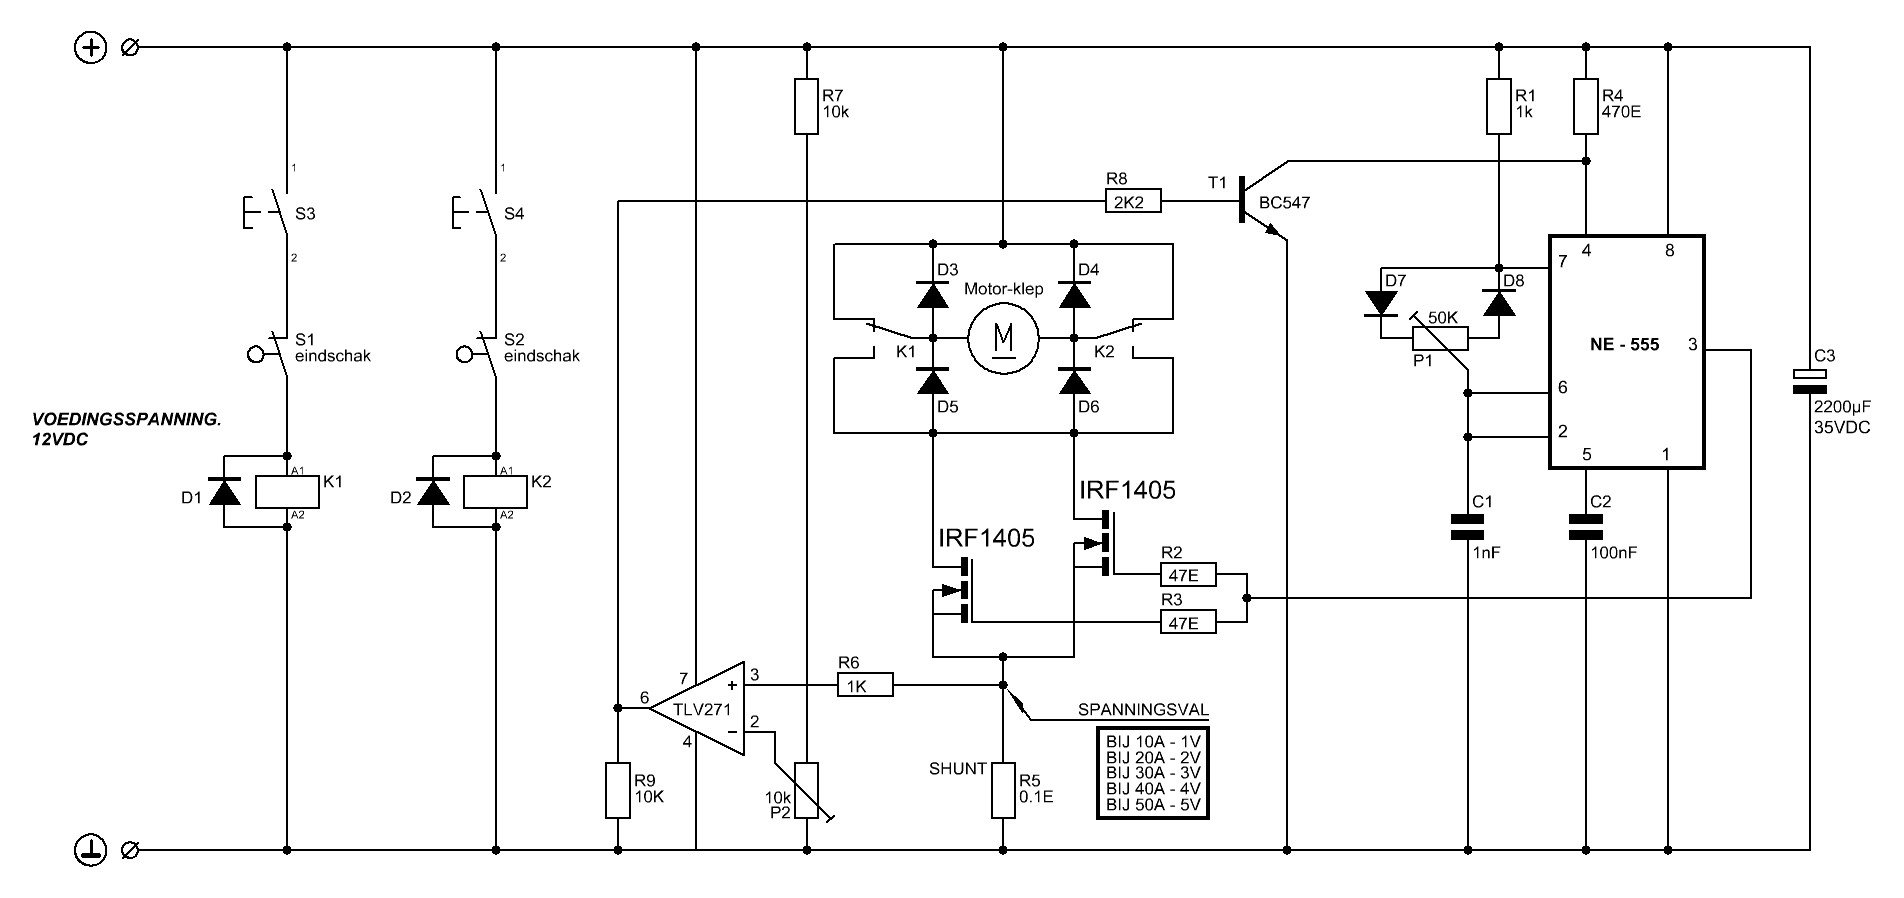 12volt 240watt motoraansturing - forum